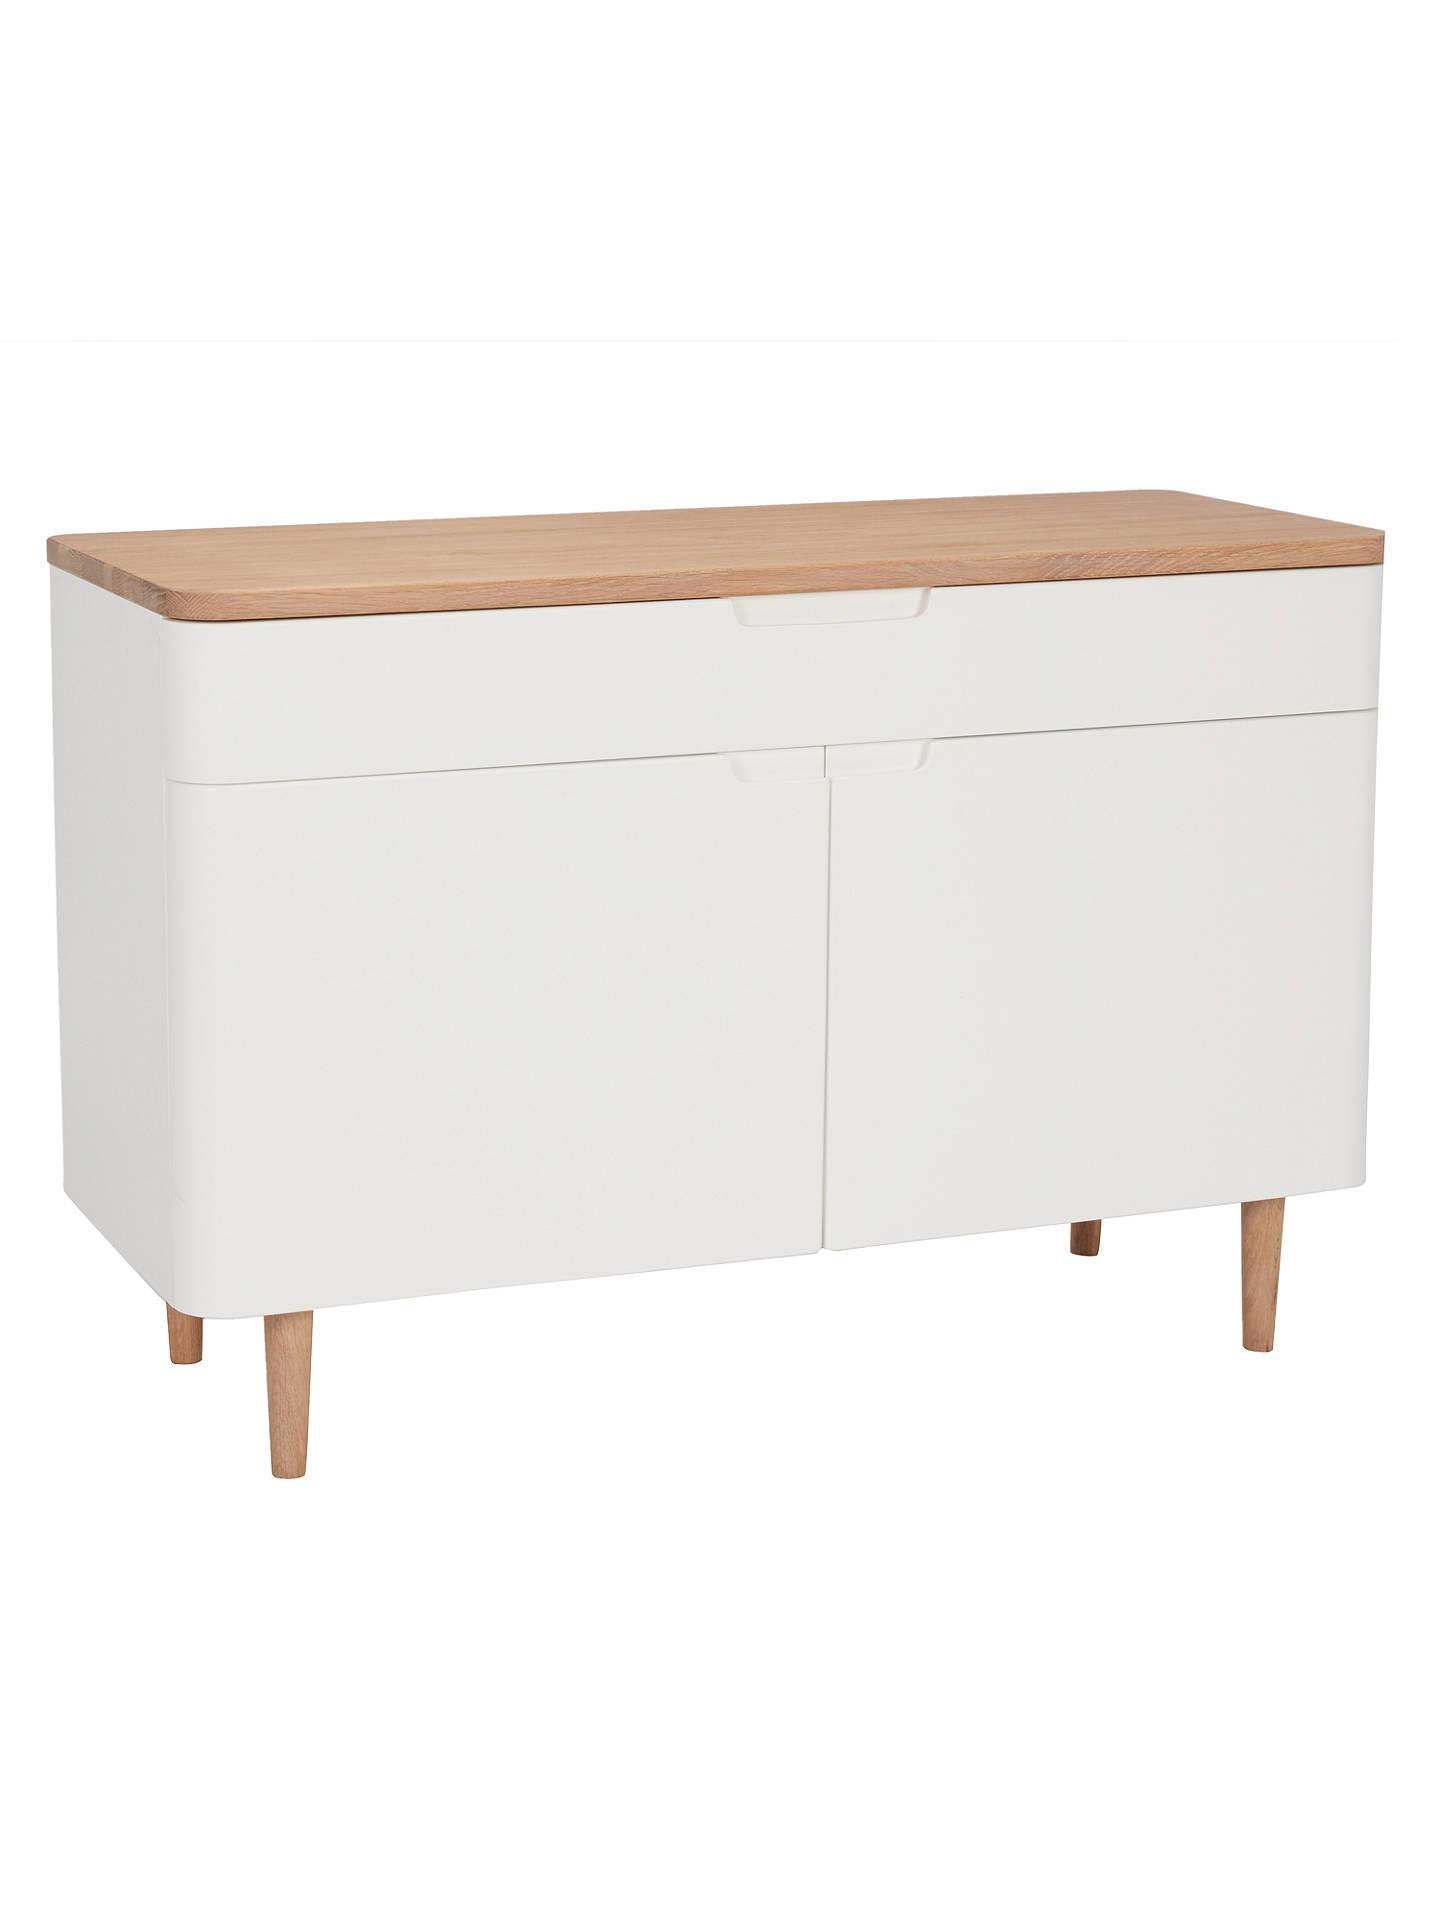 Ebbe Gehl for John Lewis Mira Small Sideboard, White Oak at John Lewis& Partners